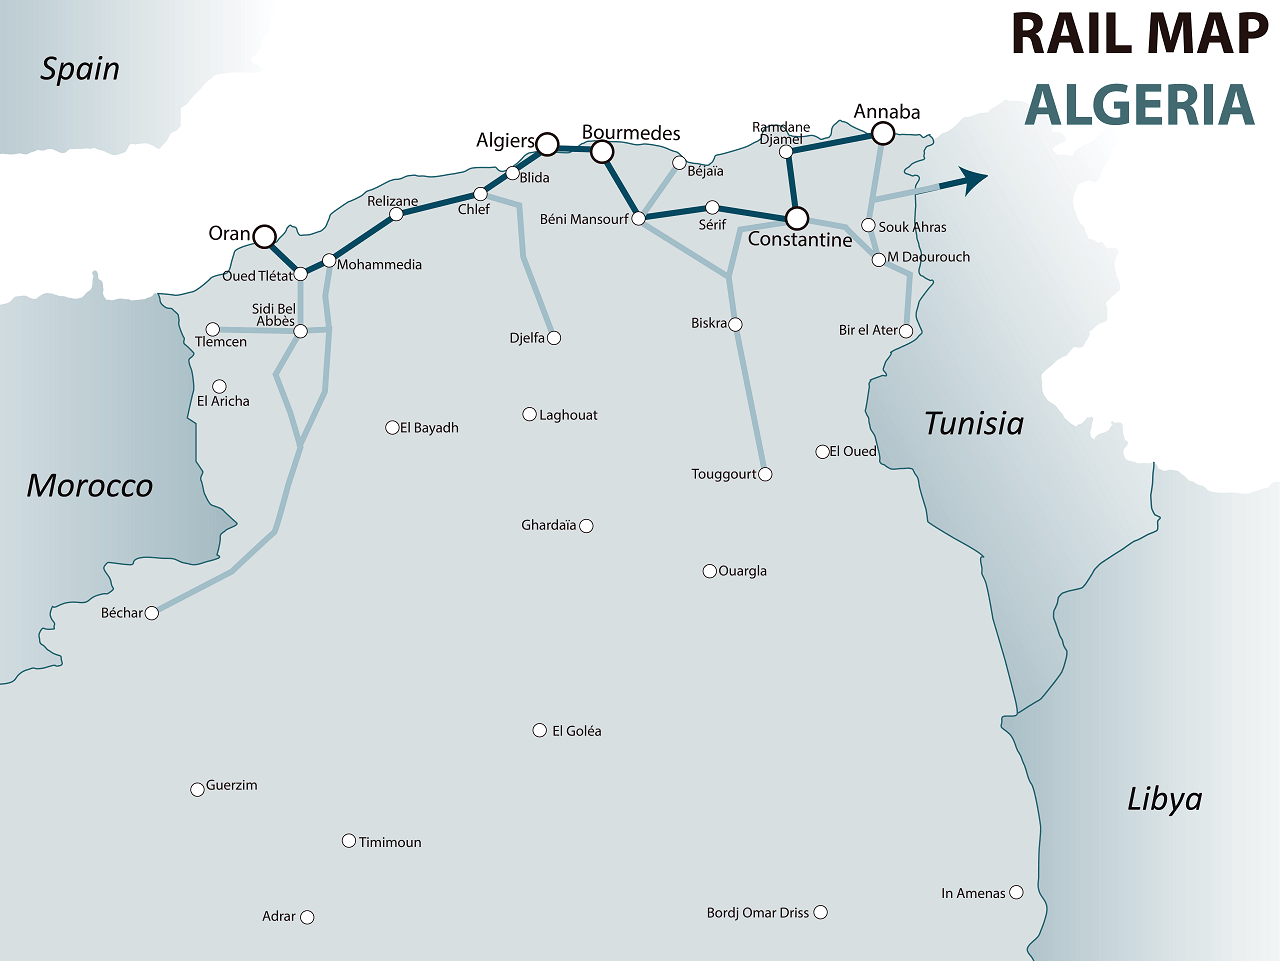 algeria rail map